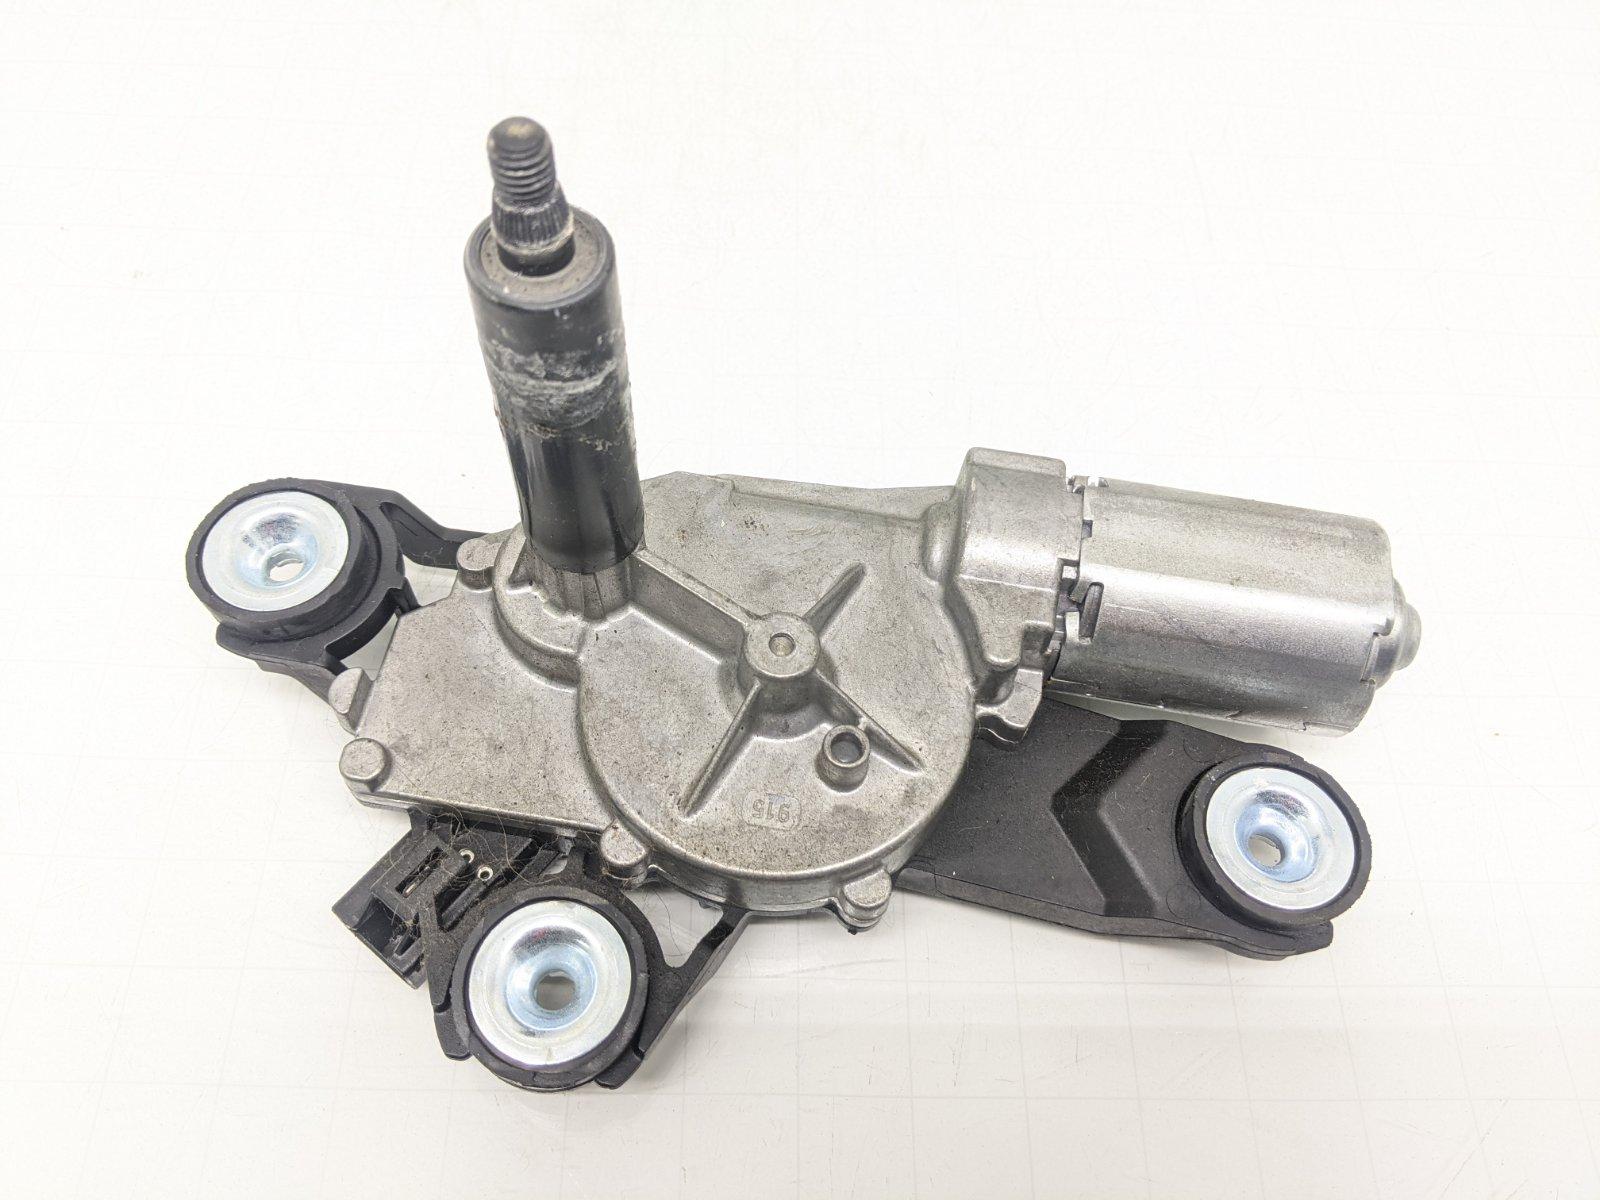 Моторчик заднего стеклоочистителя (дворника) Ford S-Max 1.8 TDCI 2008 (б/у)